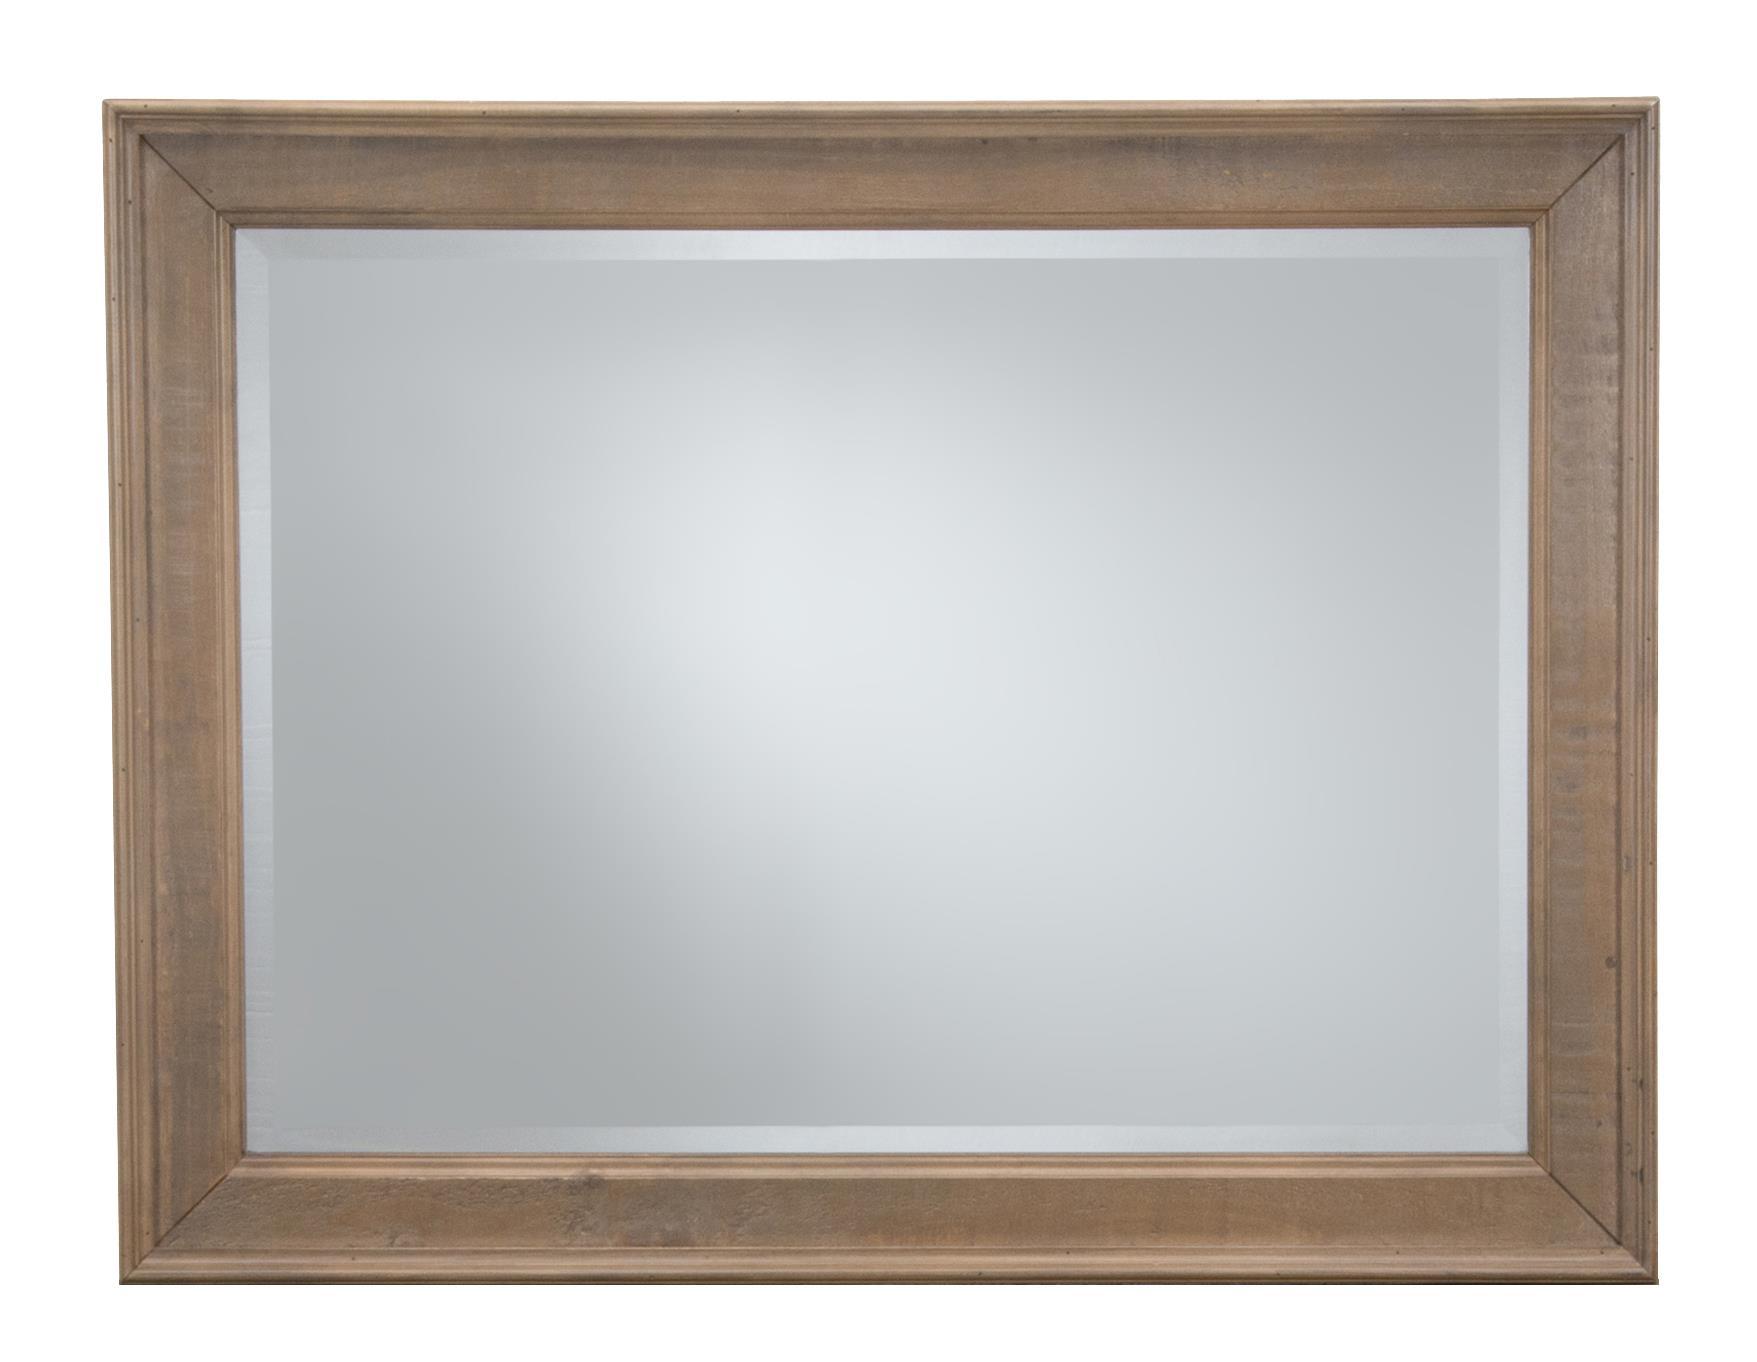 Jofran Slater Mill Pine Landscape Mirror - Item Number: 943-20